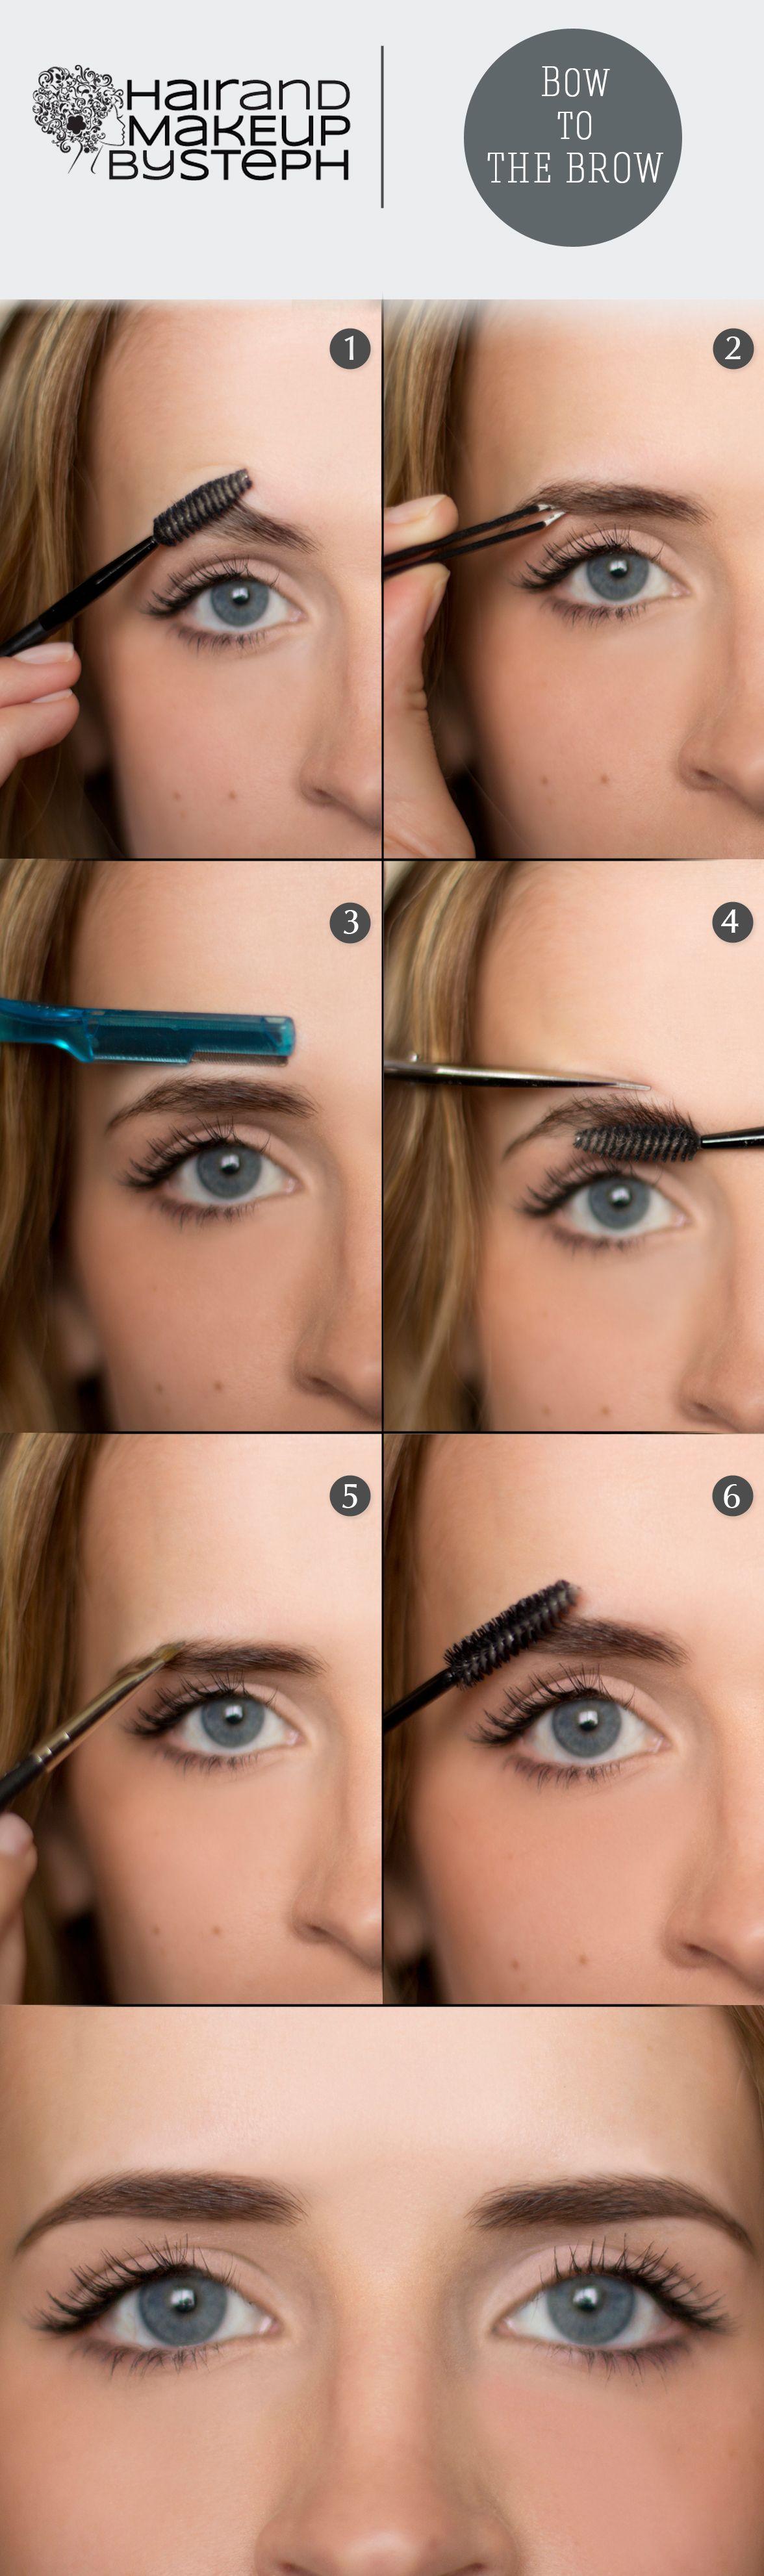 Bow To The Brow Brow Grooming Eyebrow Brows And Blog